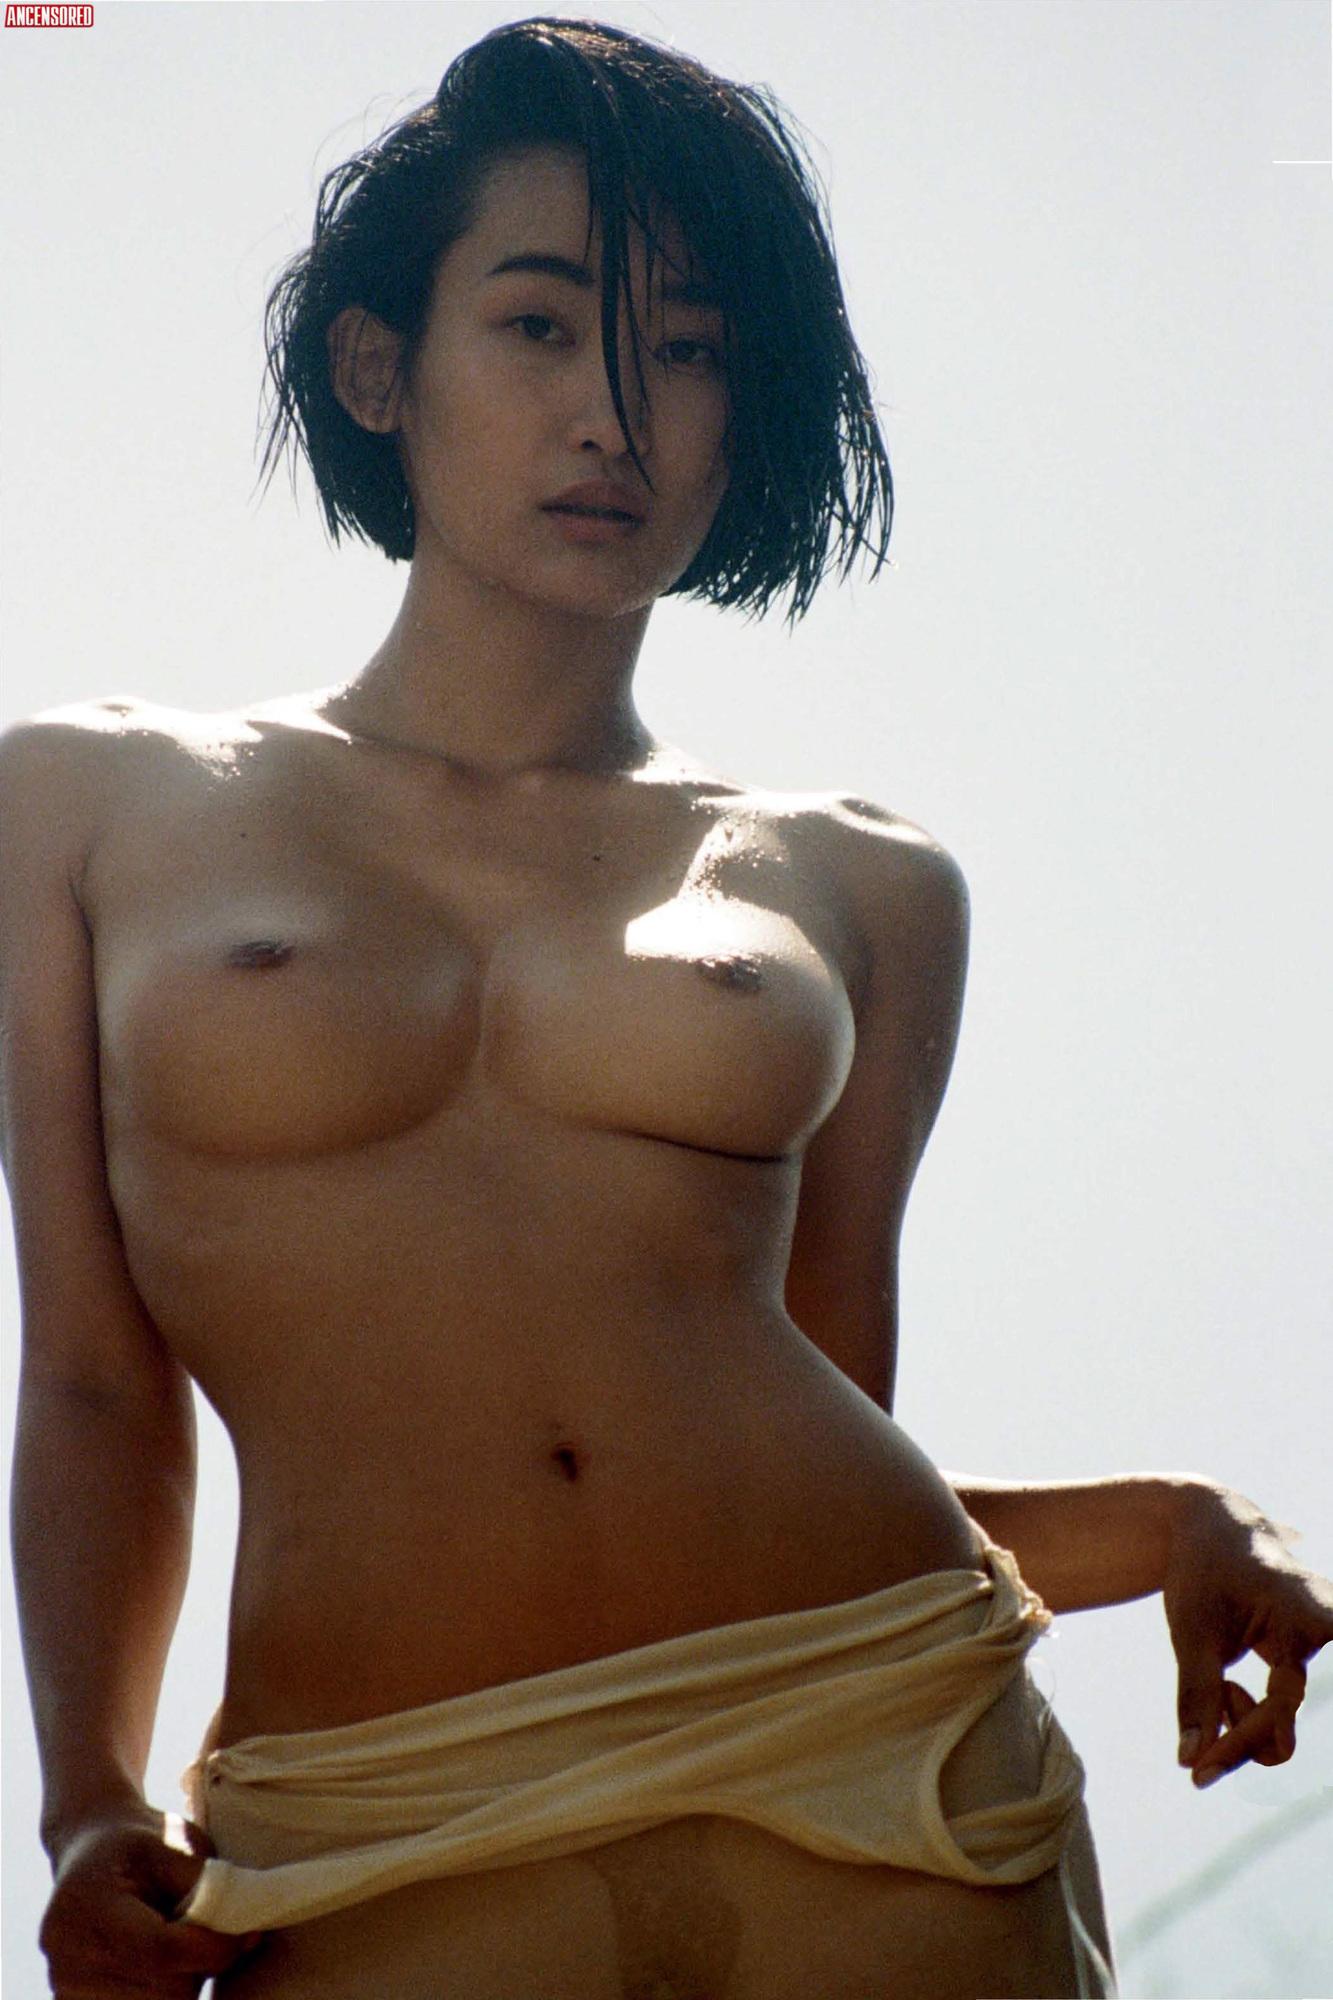 promi bilder Playboy